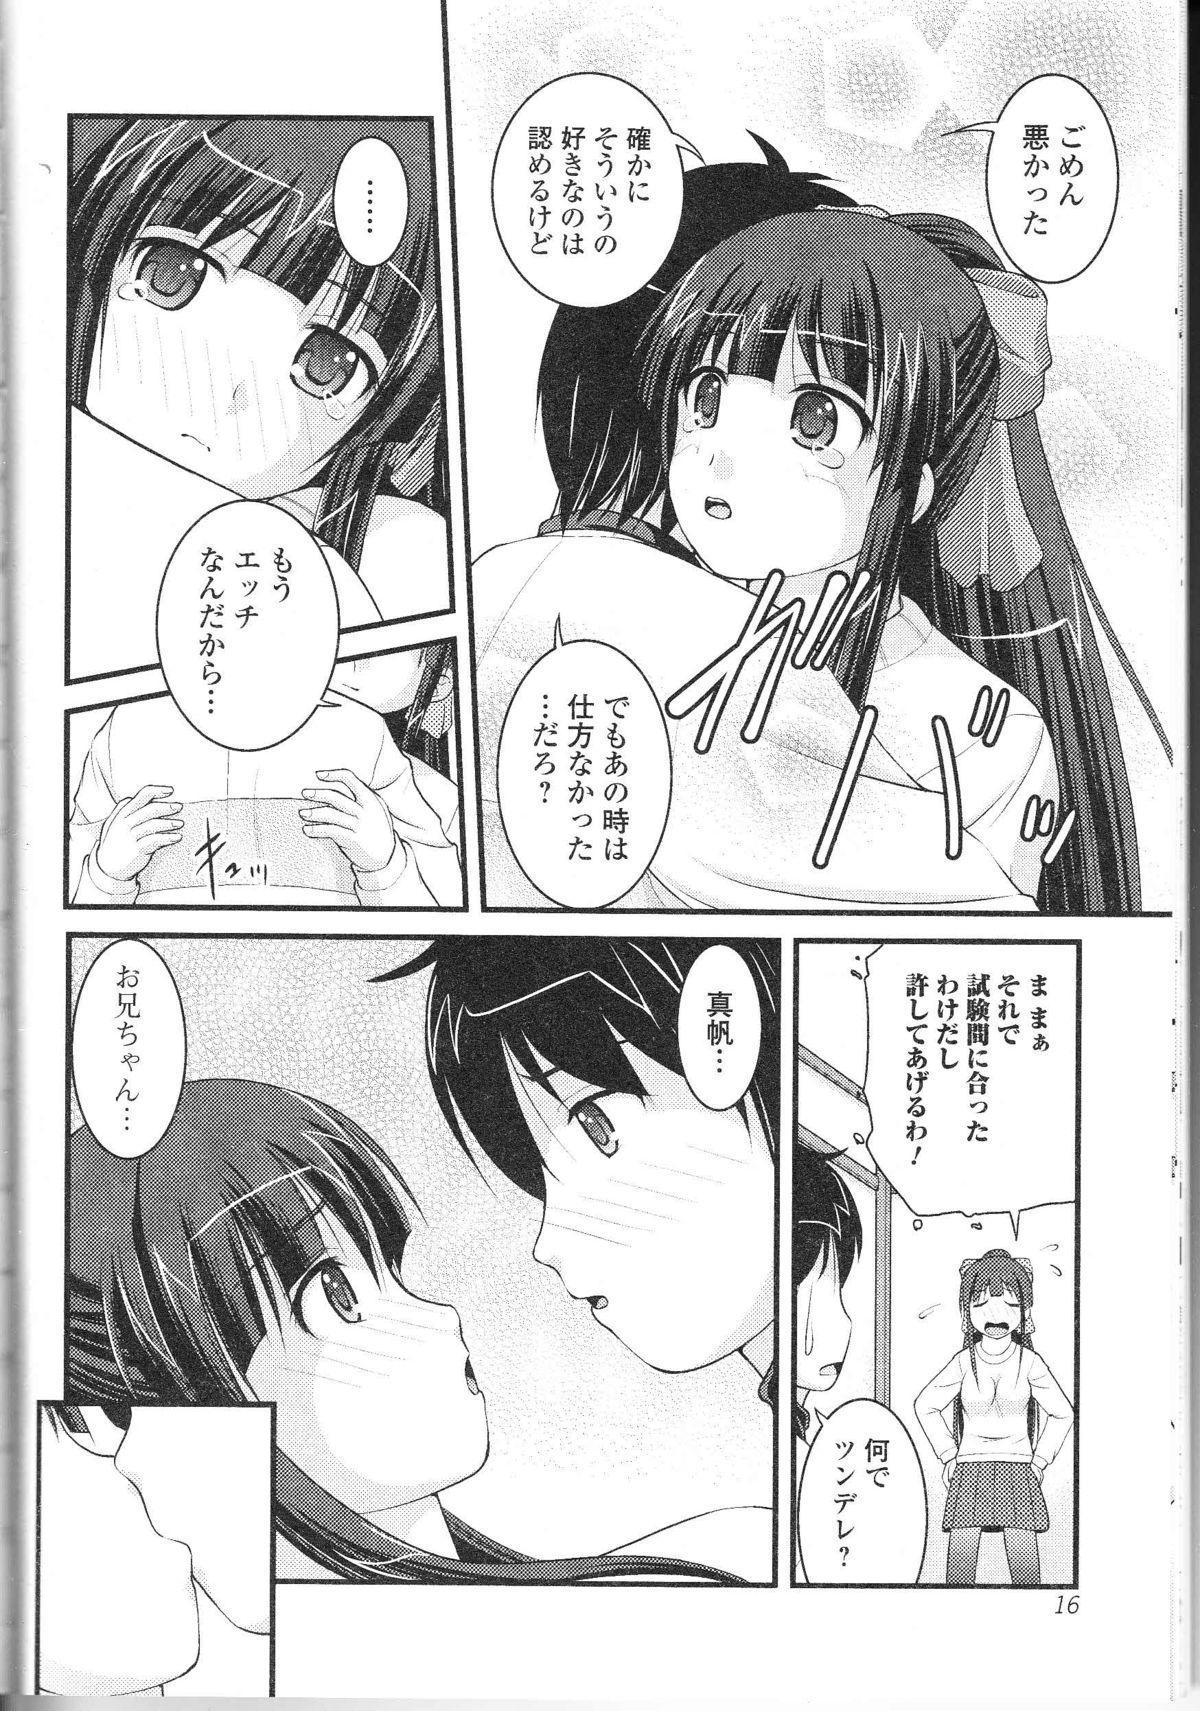 Nozoite wa Ikenai 9 - Do Not Peep! 9 14